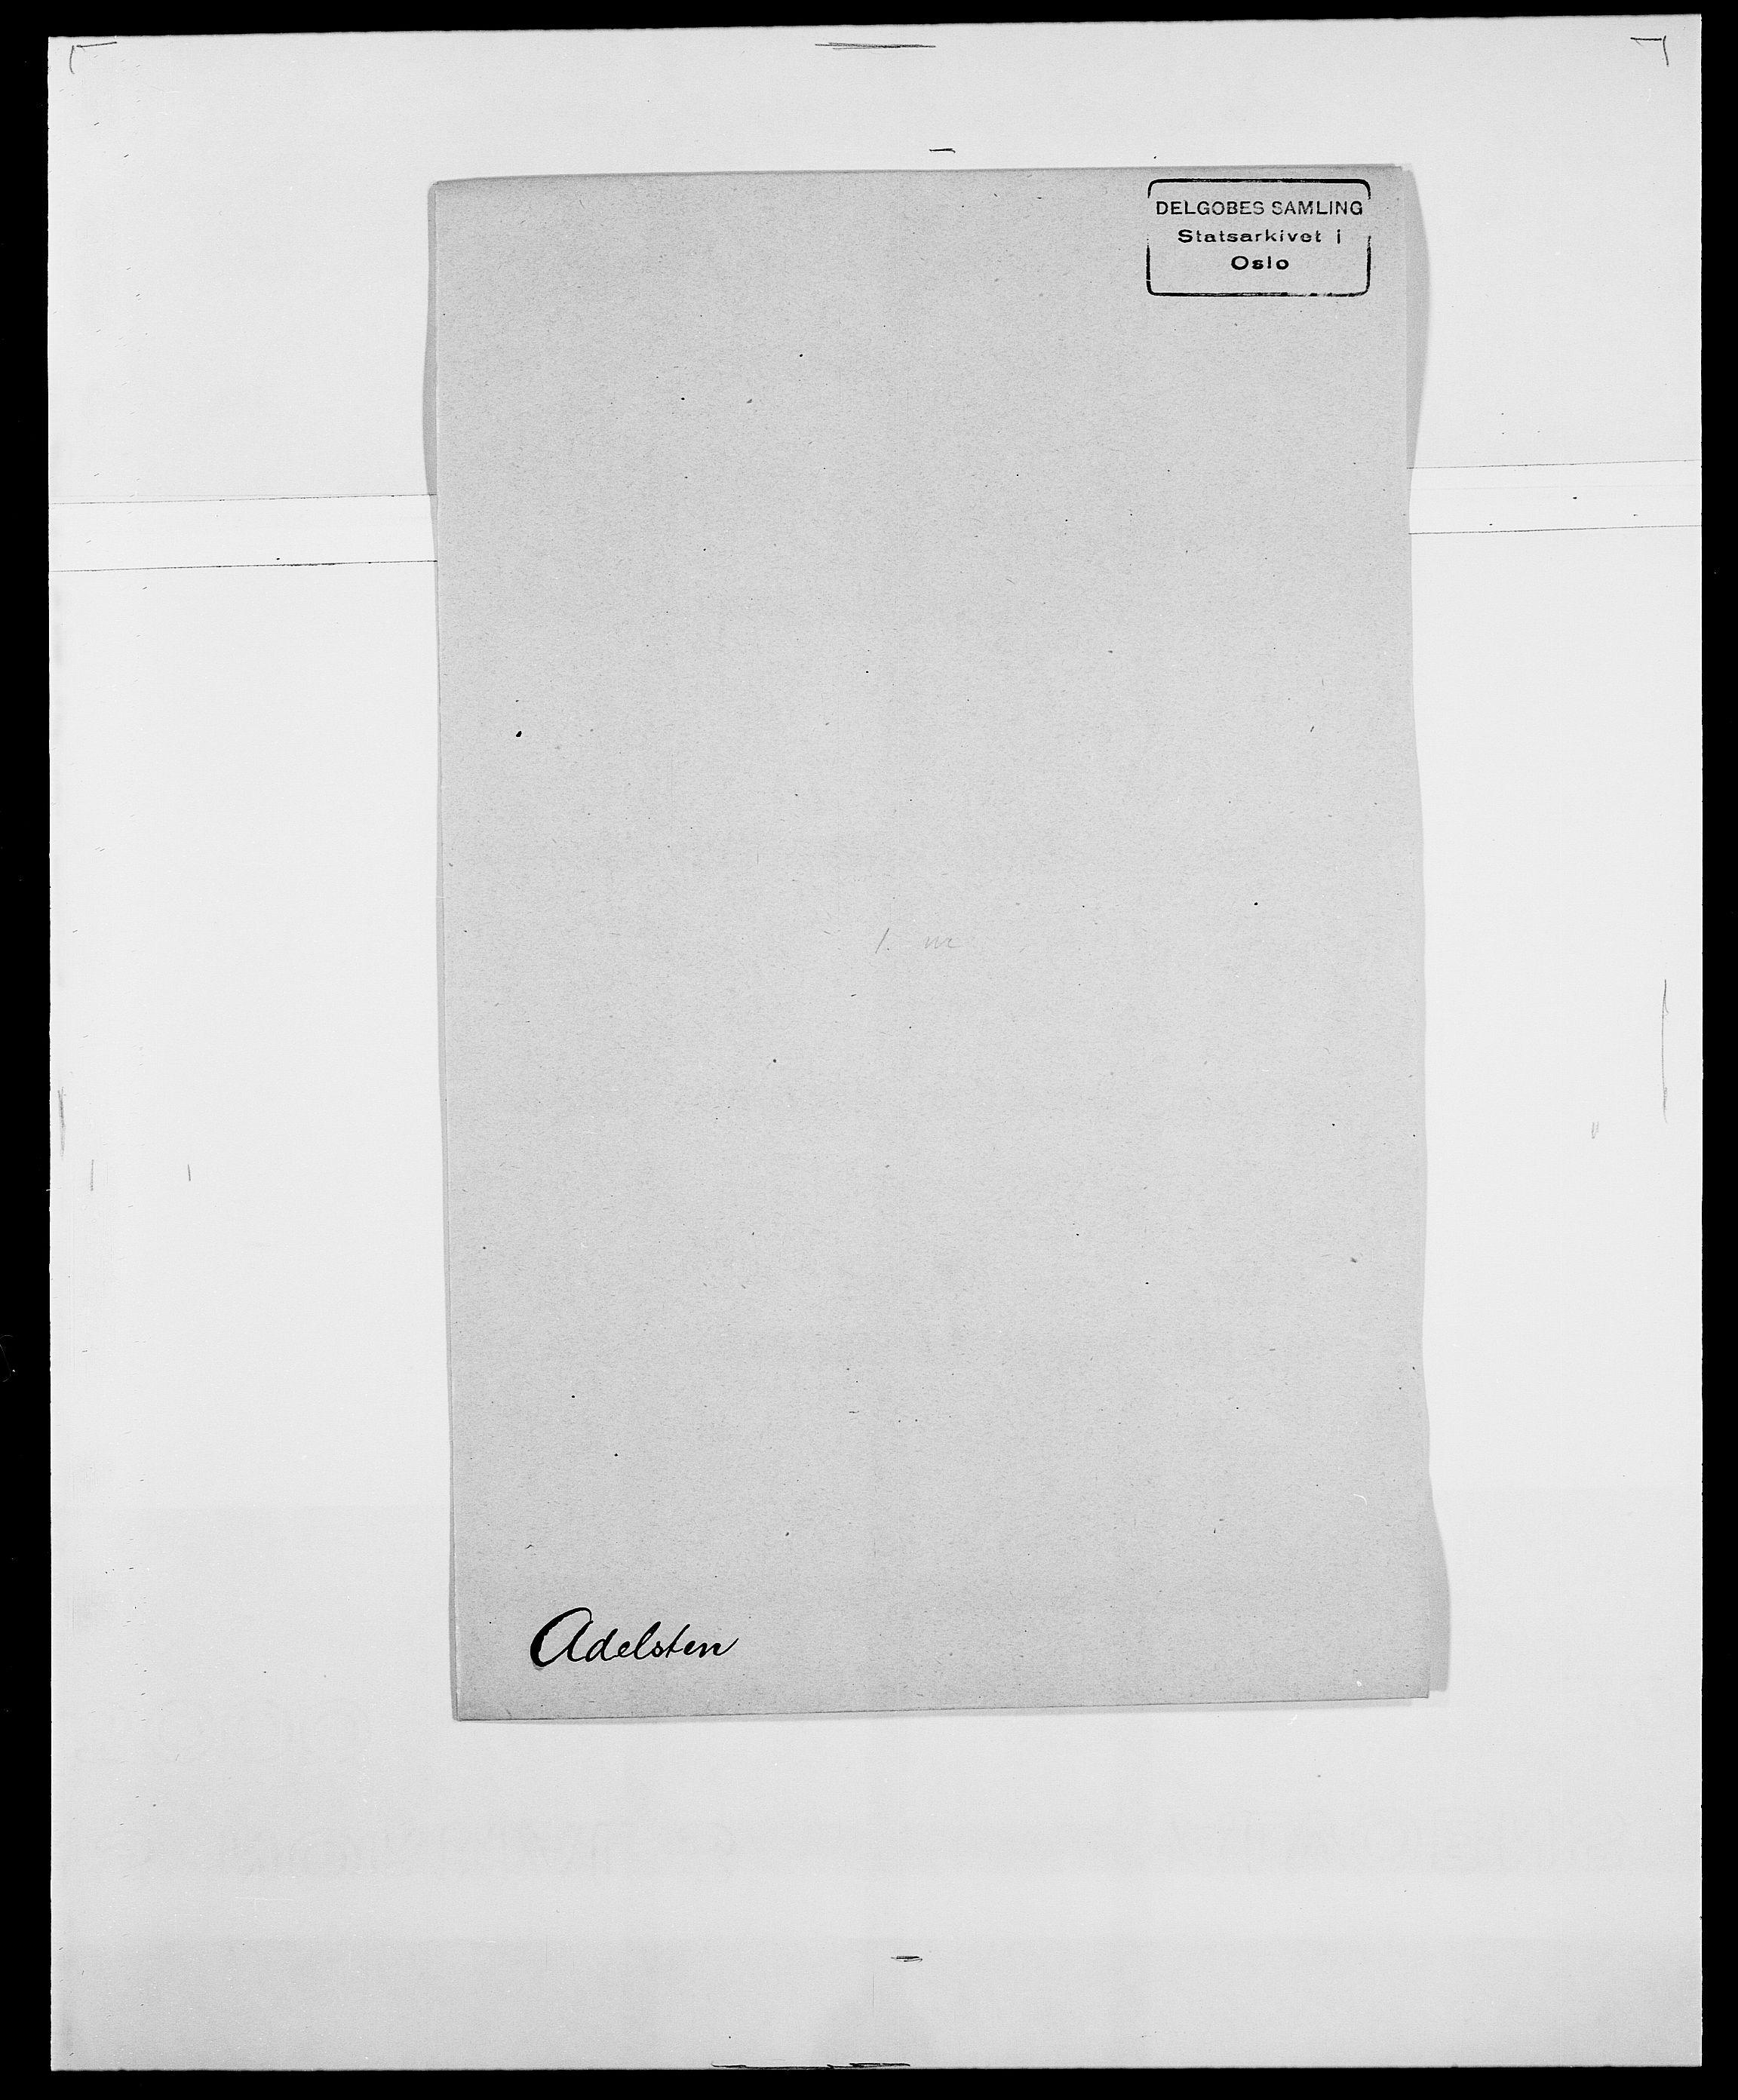 SAO, Delgobe, Charles Antoine - samling, D/Da/L0001: Aabye - Angerman, s. 252